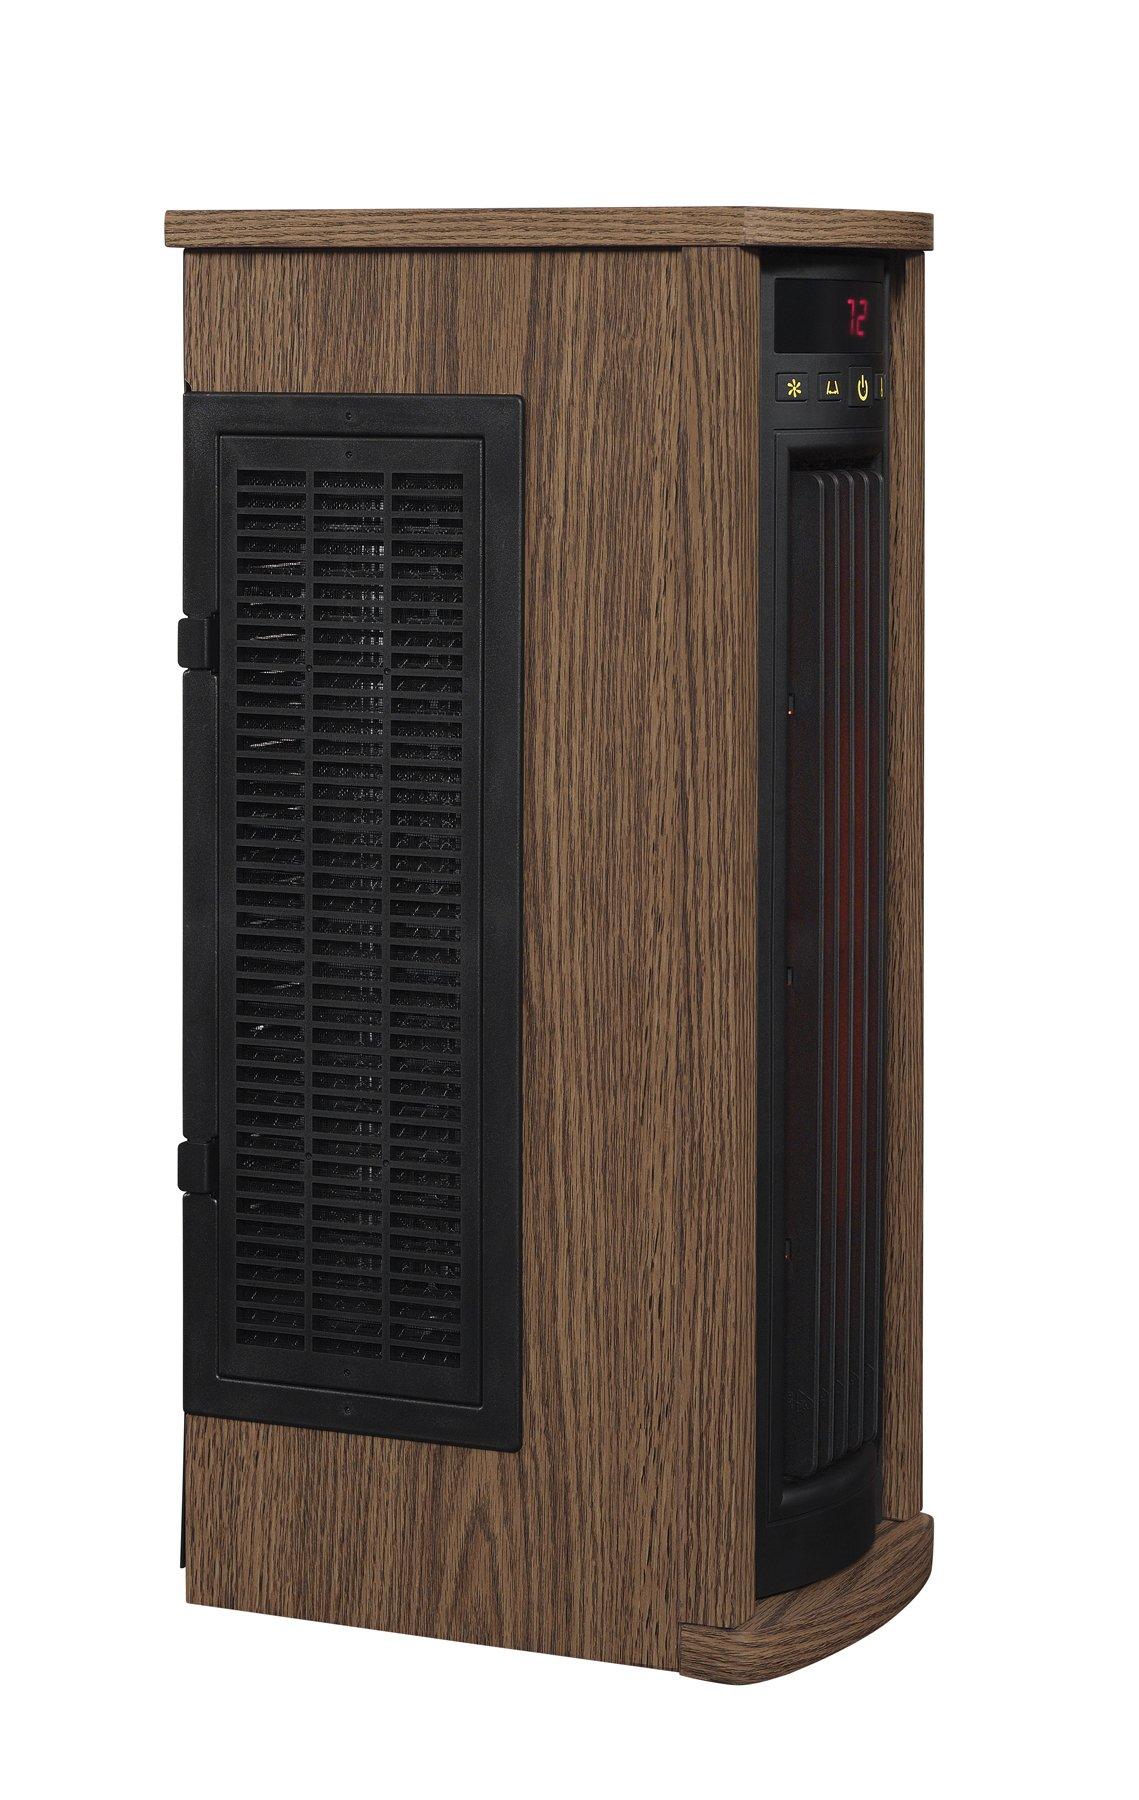 Duraflame 5HM7000-PO78 Portable Electric Infrared Quartz Oscillating Tower Heater, Oak